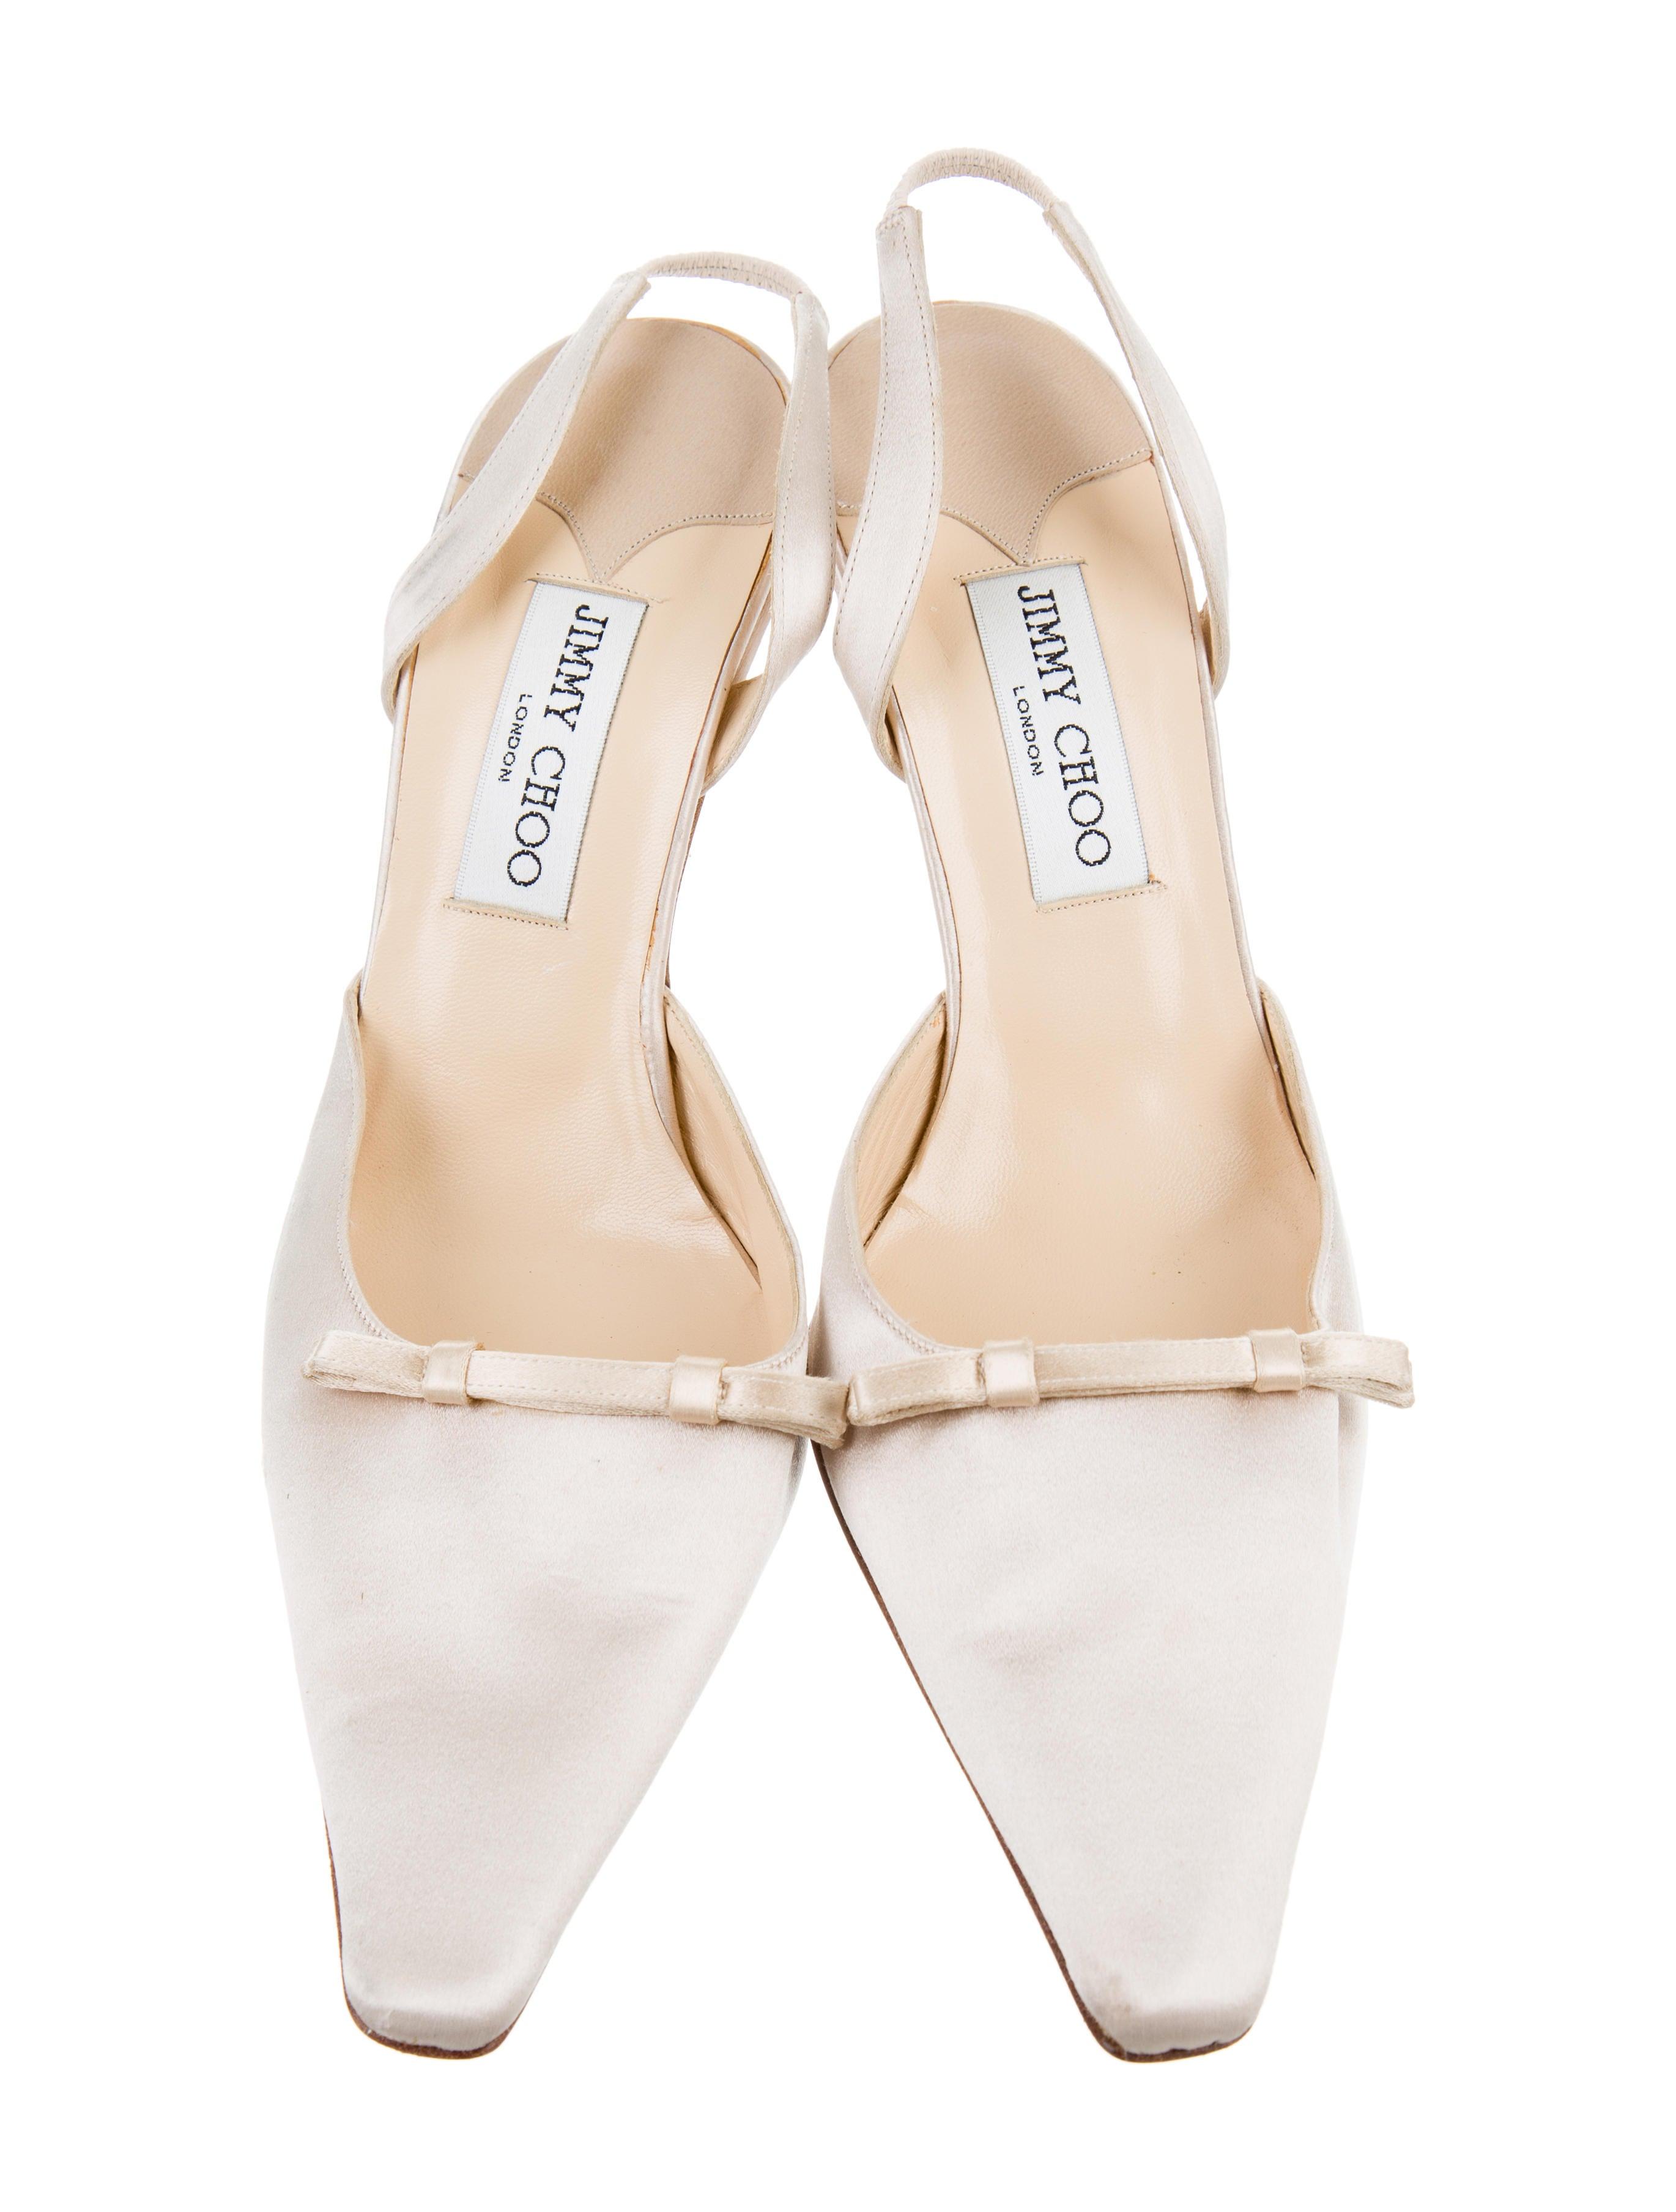 jimmy choo satin slingback pumps shoes jim70858 the. Black Bedroom Furniture Sets. Home Design Ideas